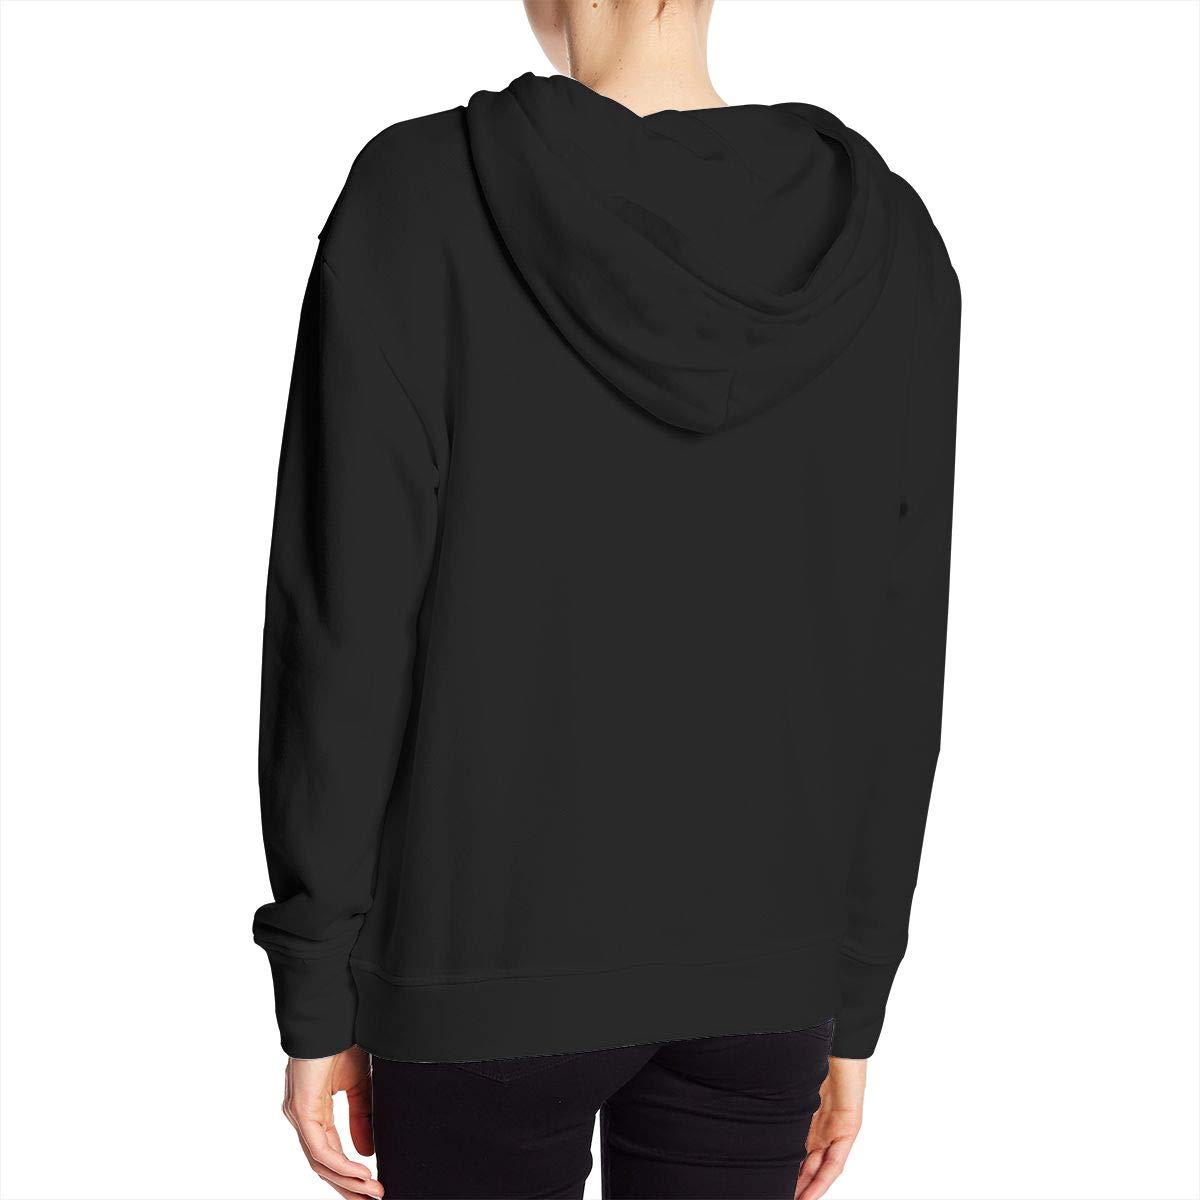 PJJ Y KING Dave Matthews Band Womens Long Sleeve Pullover Hoodie Pocket Sweatshirts